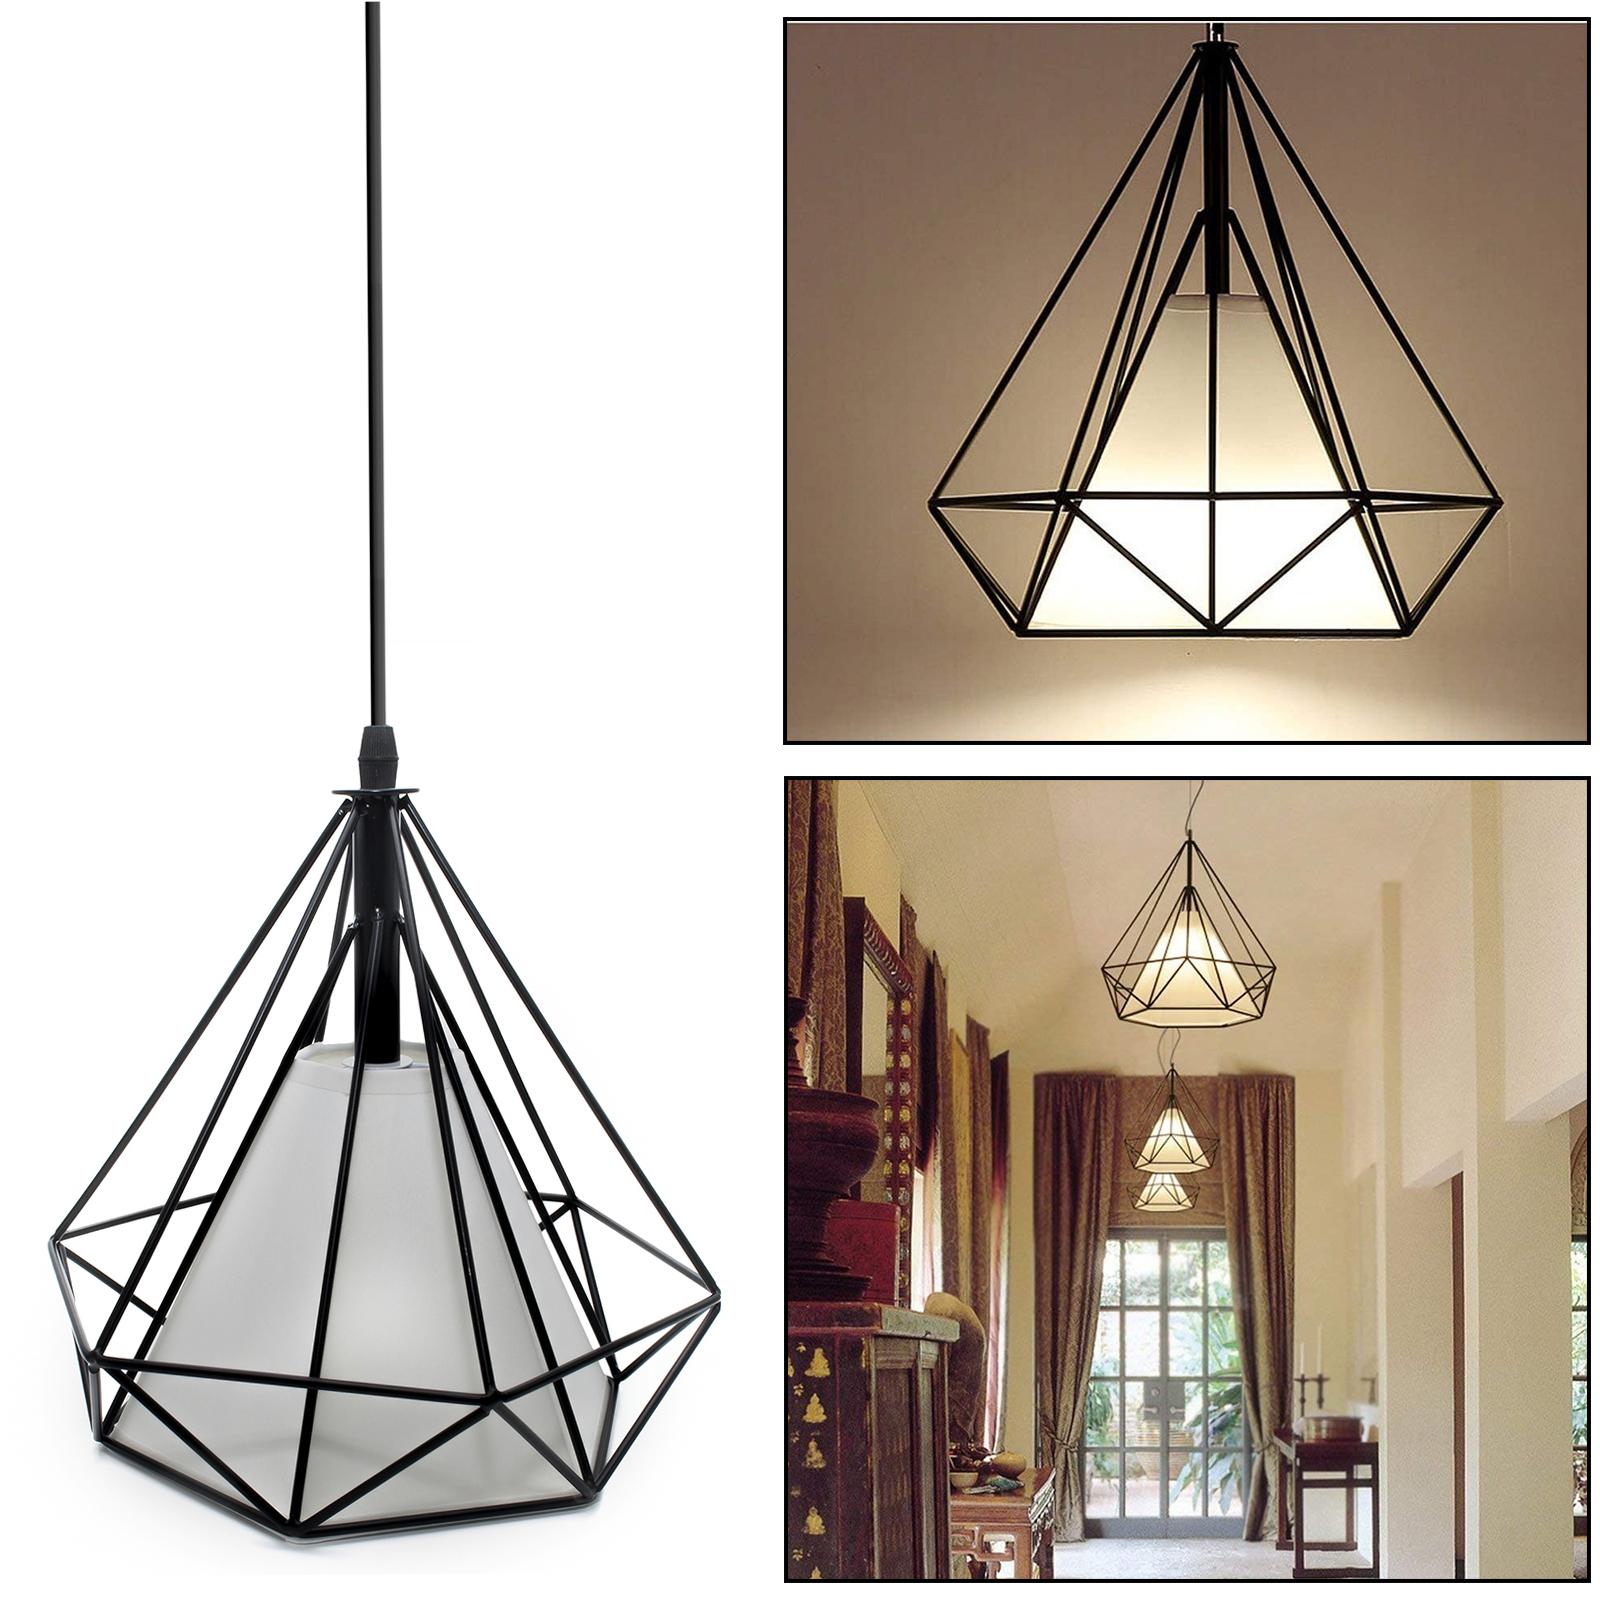 Lampade Pendenti Sospensioni Moderne Lampada A Sospensione Design Moderna Paralume Tessuto Led 18w Luce Tavolo